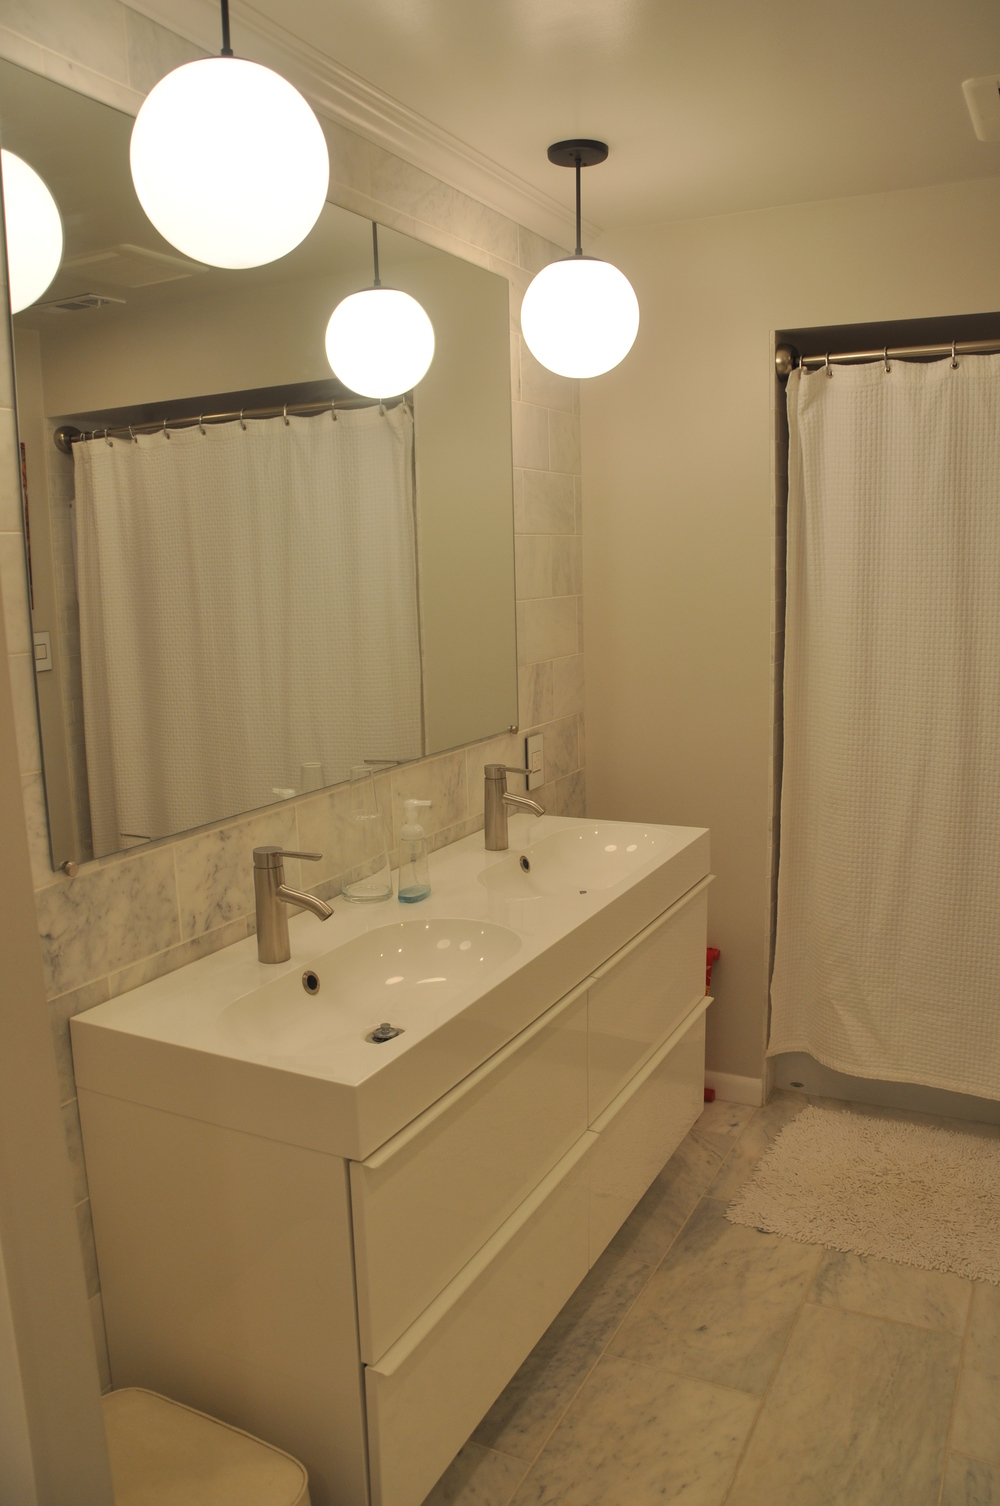 The basement bathroom.